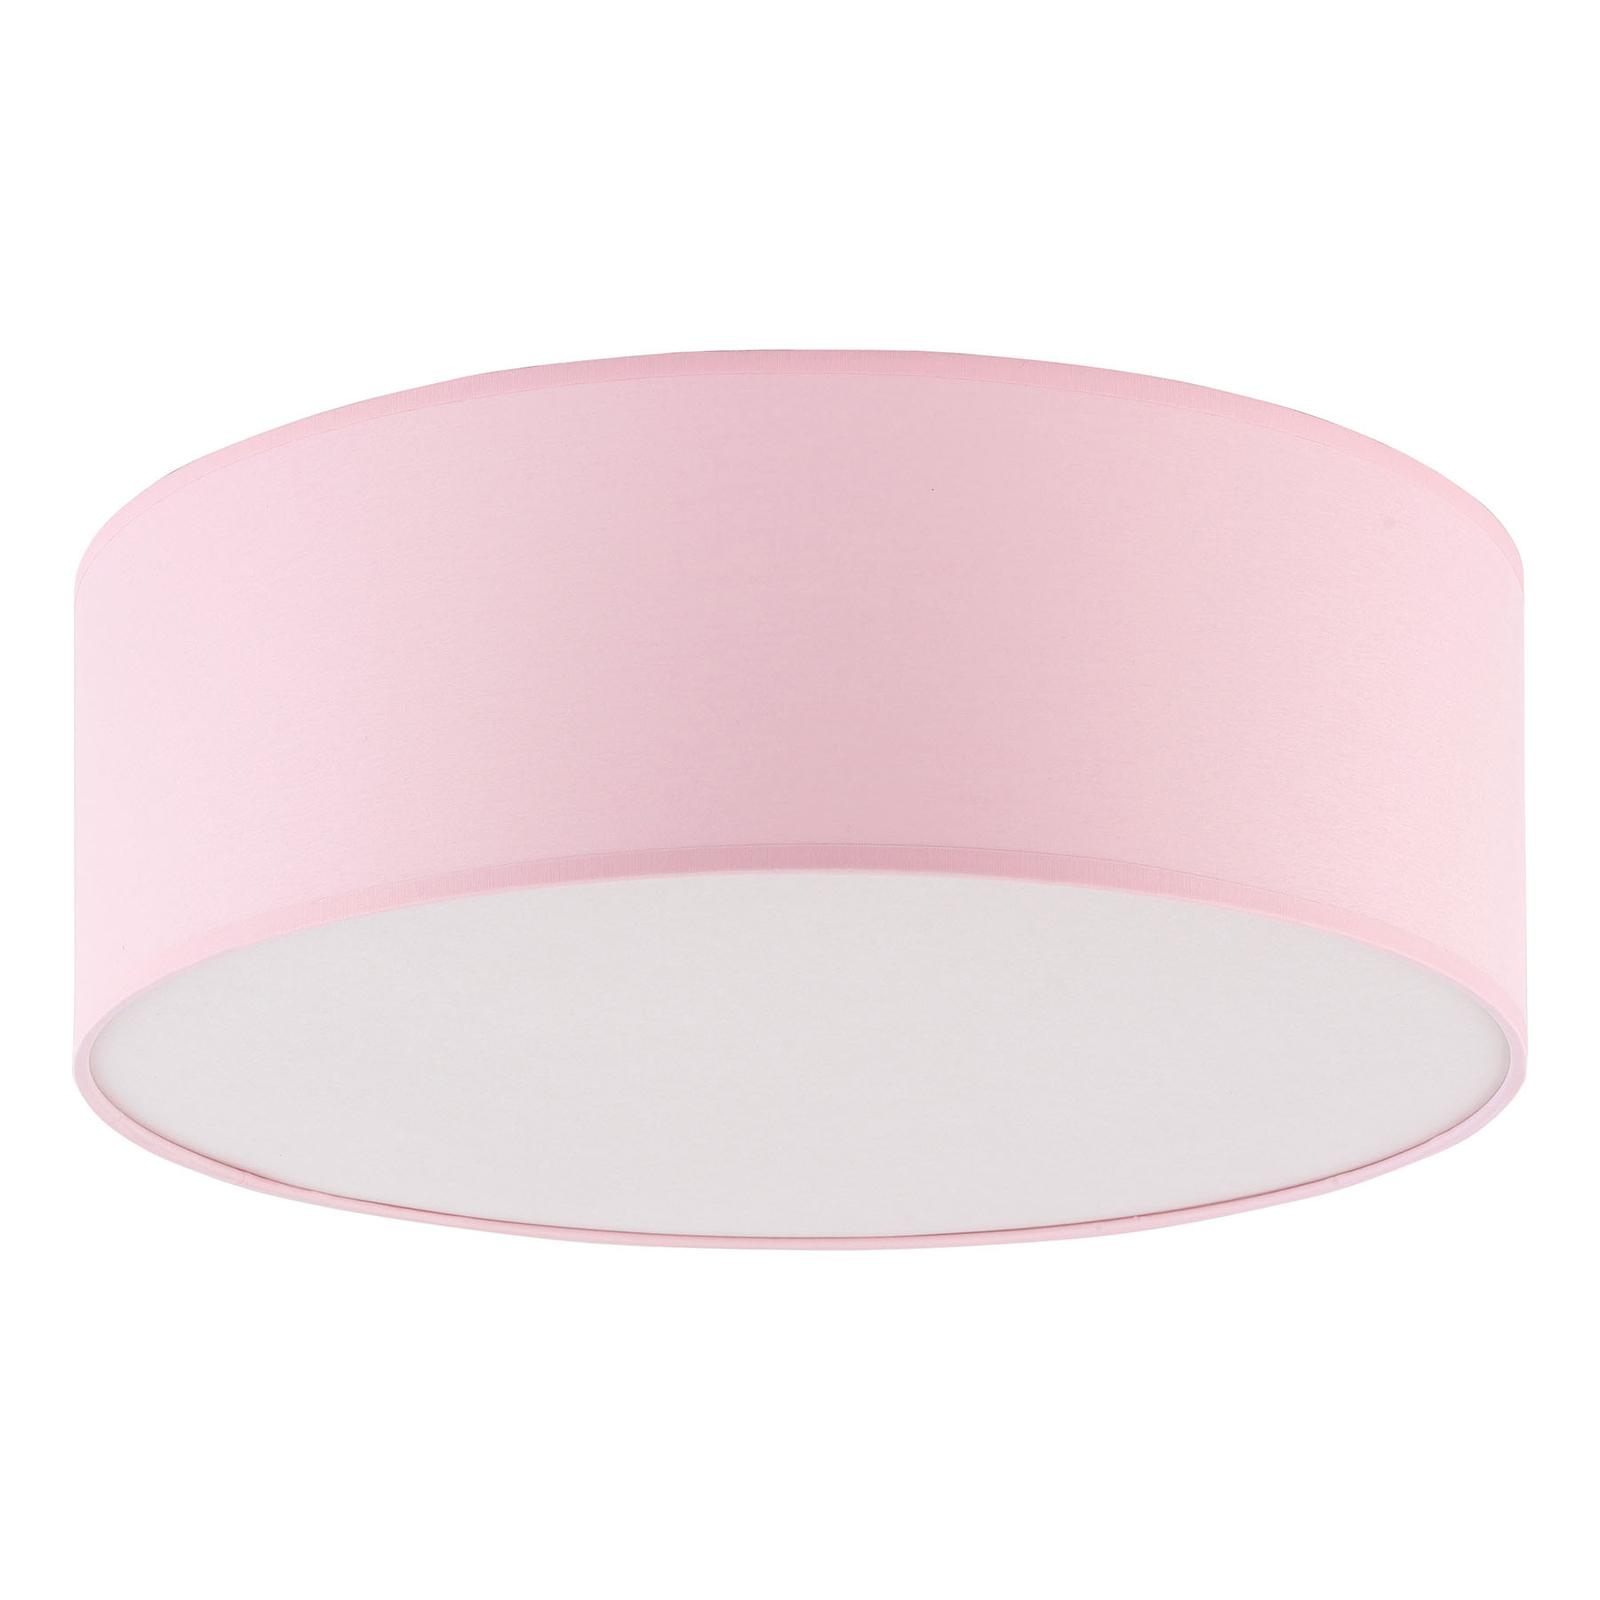 Plafondlamp Rondo Kids, Ø 38 cm, roze